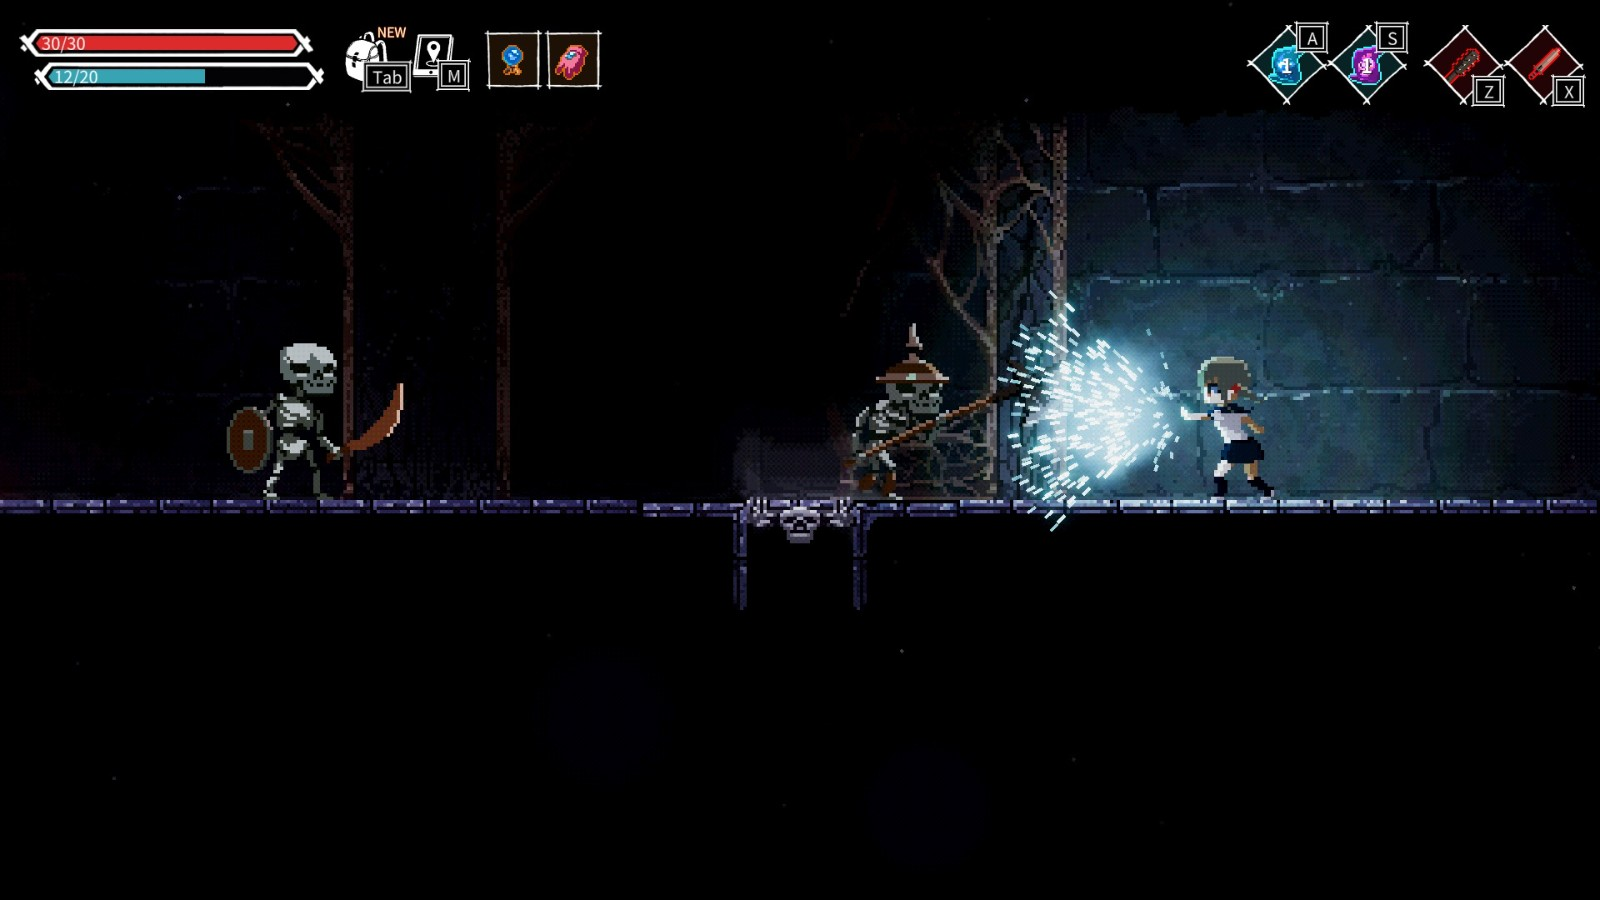 2D动画求生动作游戏《失落废墟》5月13日登陆PC